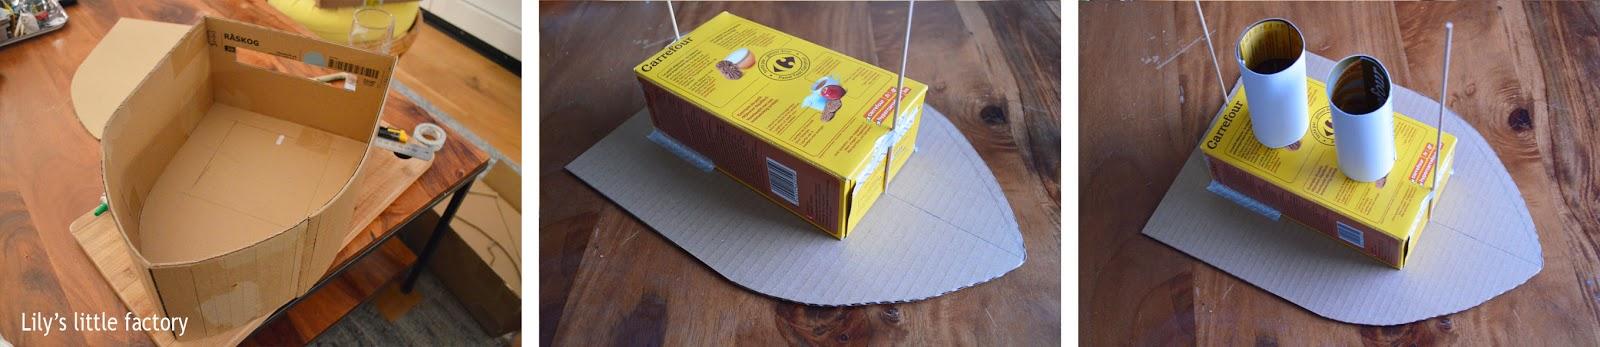 fabriquer pinata avec boite carton et31 jornalagora. Black Bedroom Furniture Sets. Home Design Ideas